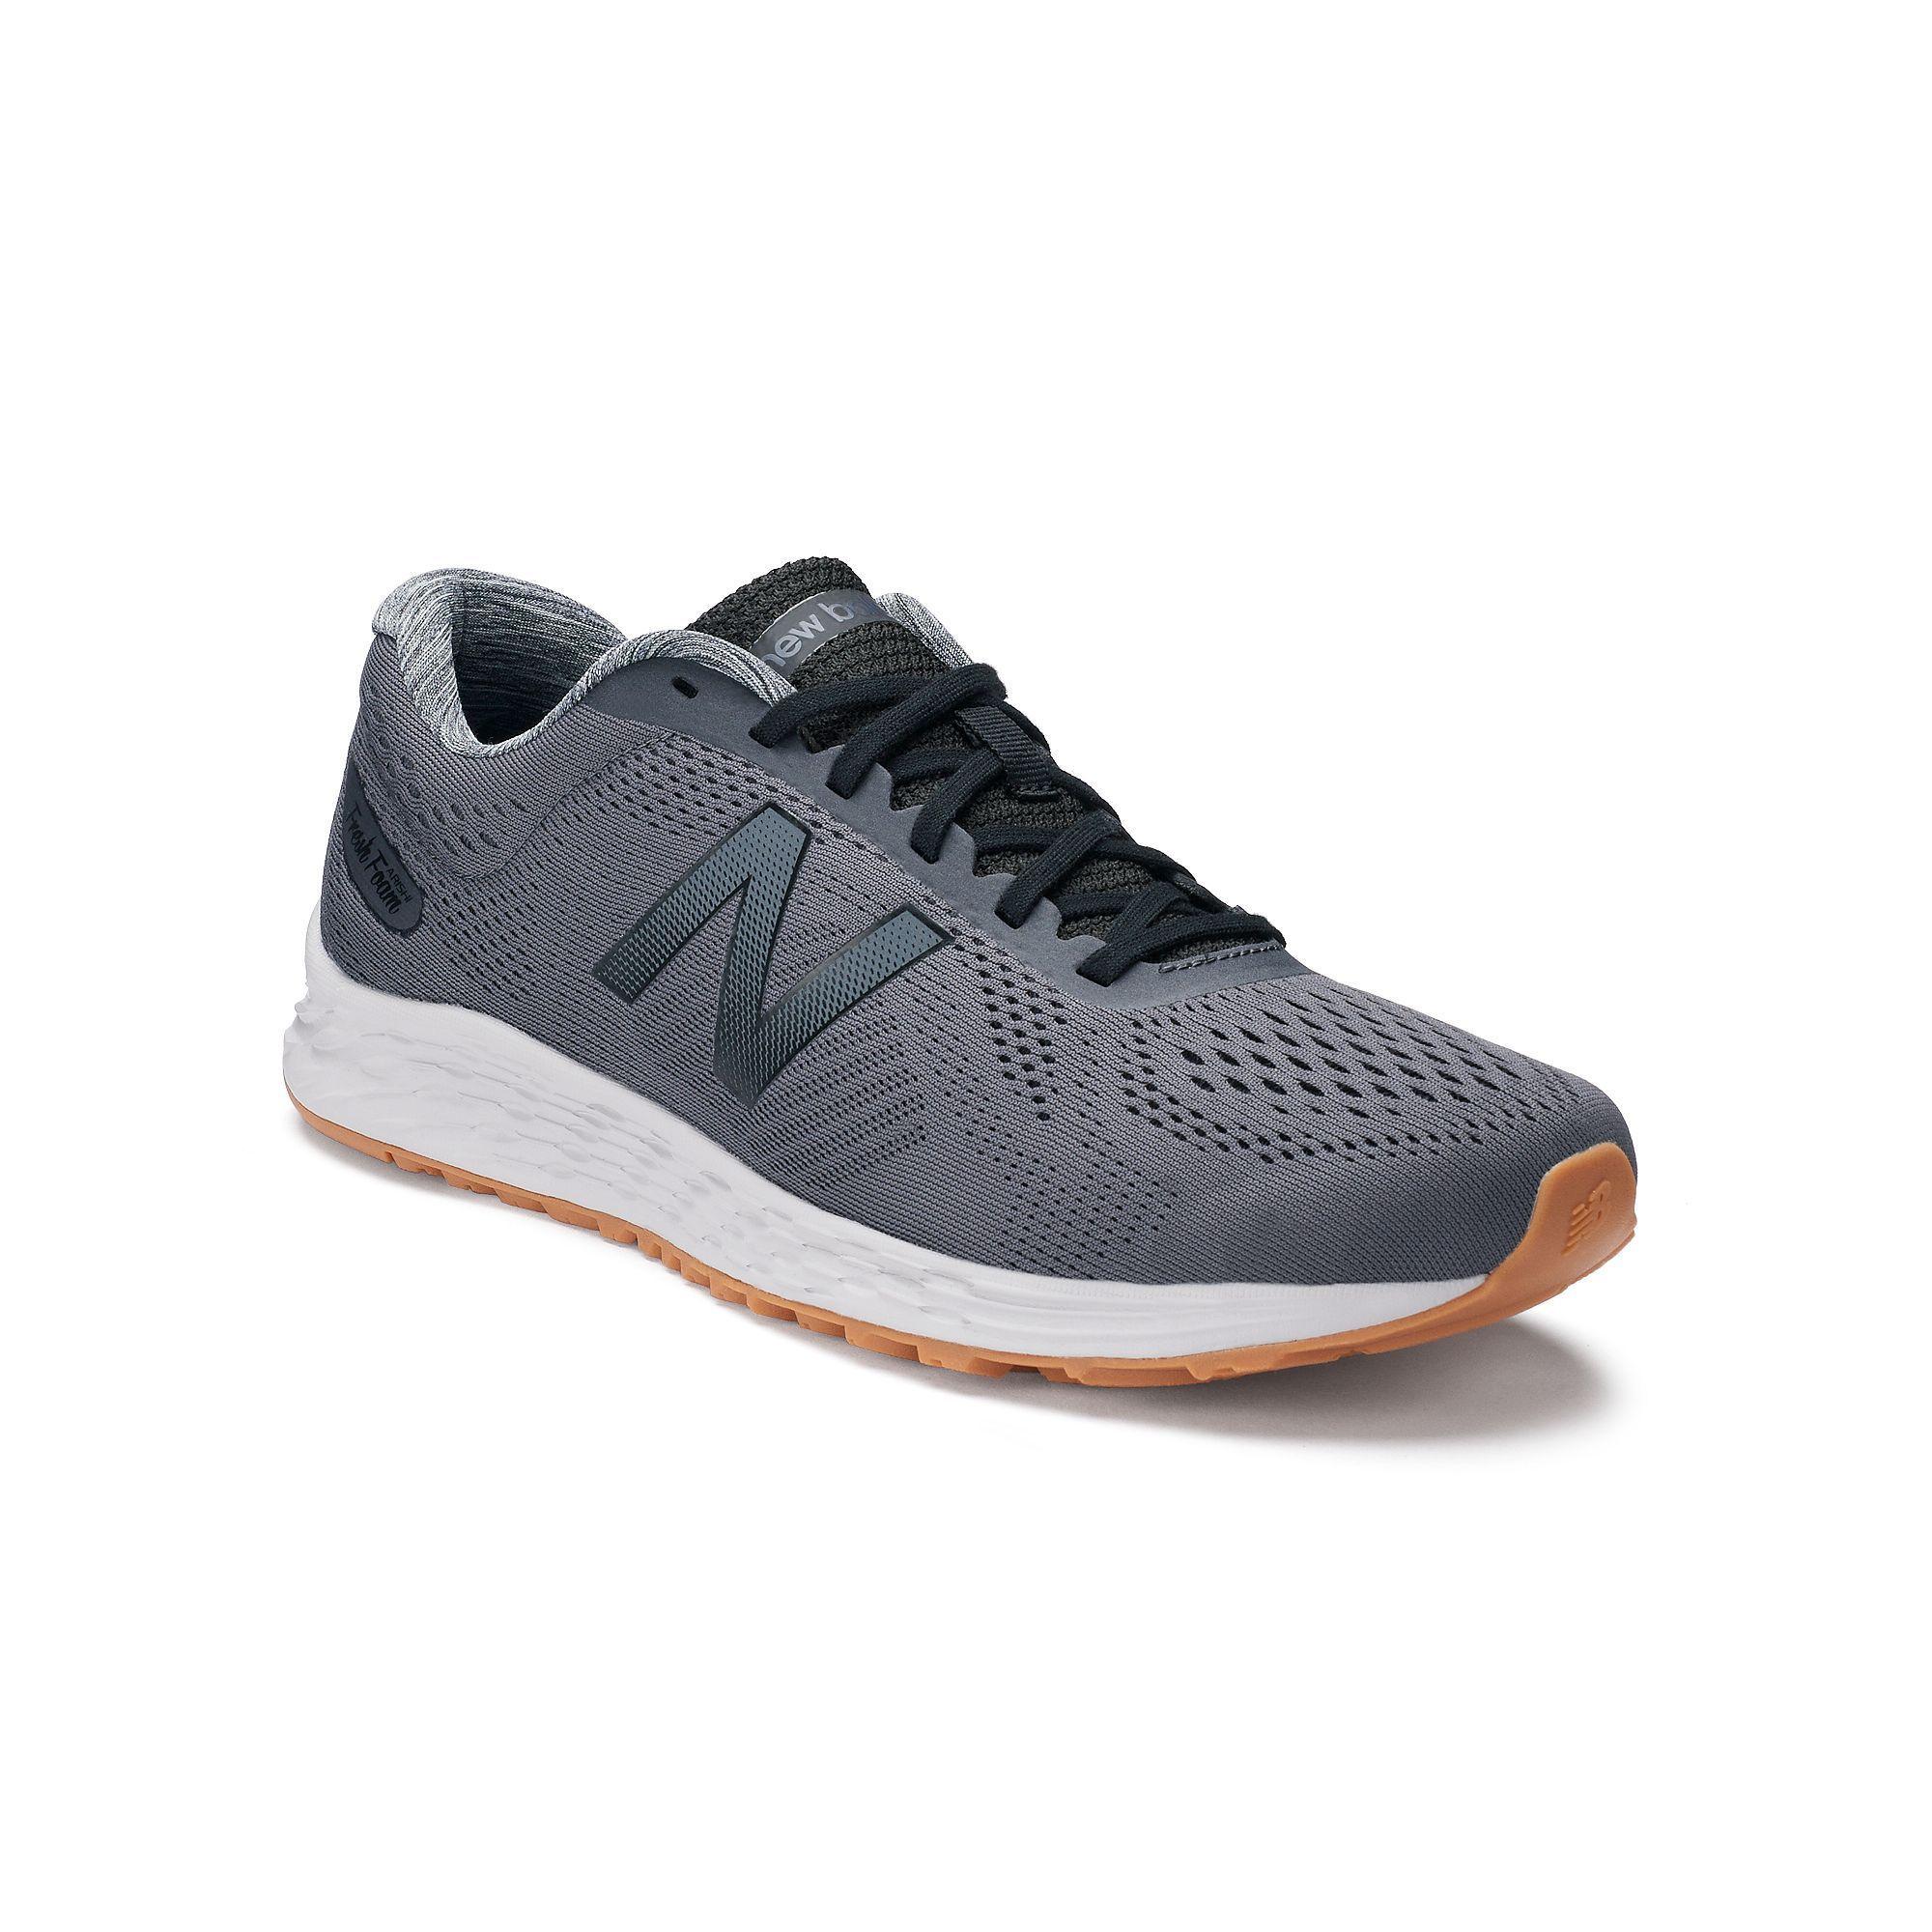 ad1c5d1f6d70d New Balance Fresh Foam Arishi Men's Running Shoes, Size: 10.5 Wide, Grey